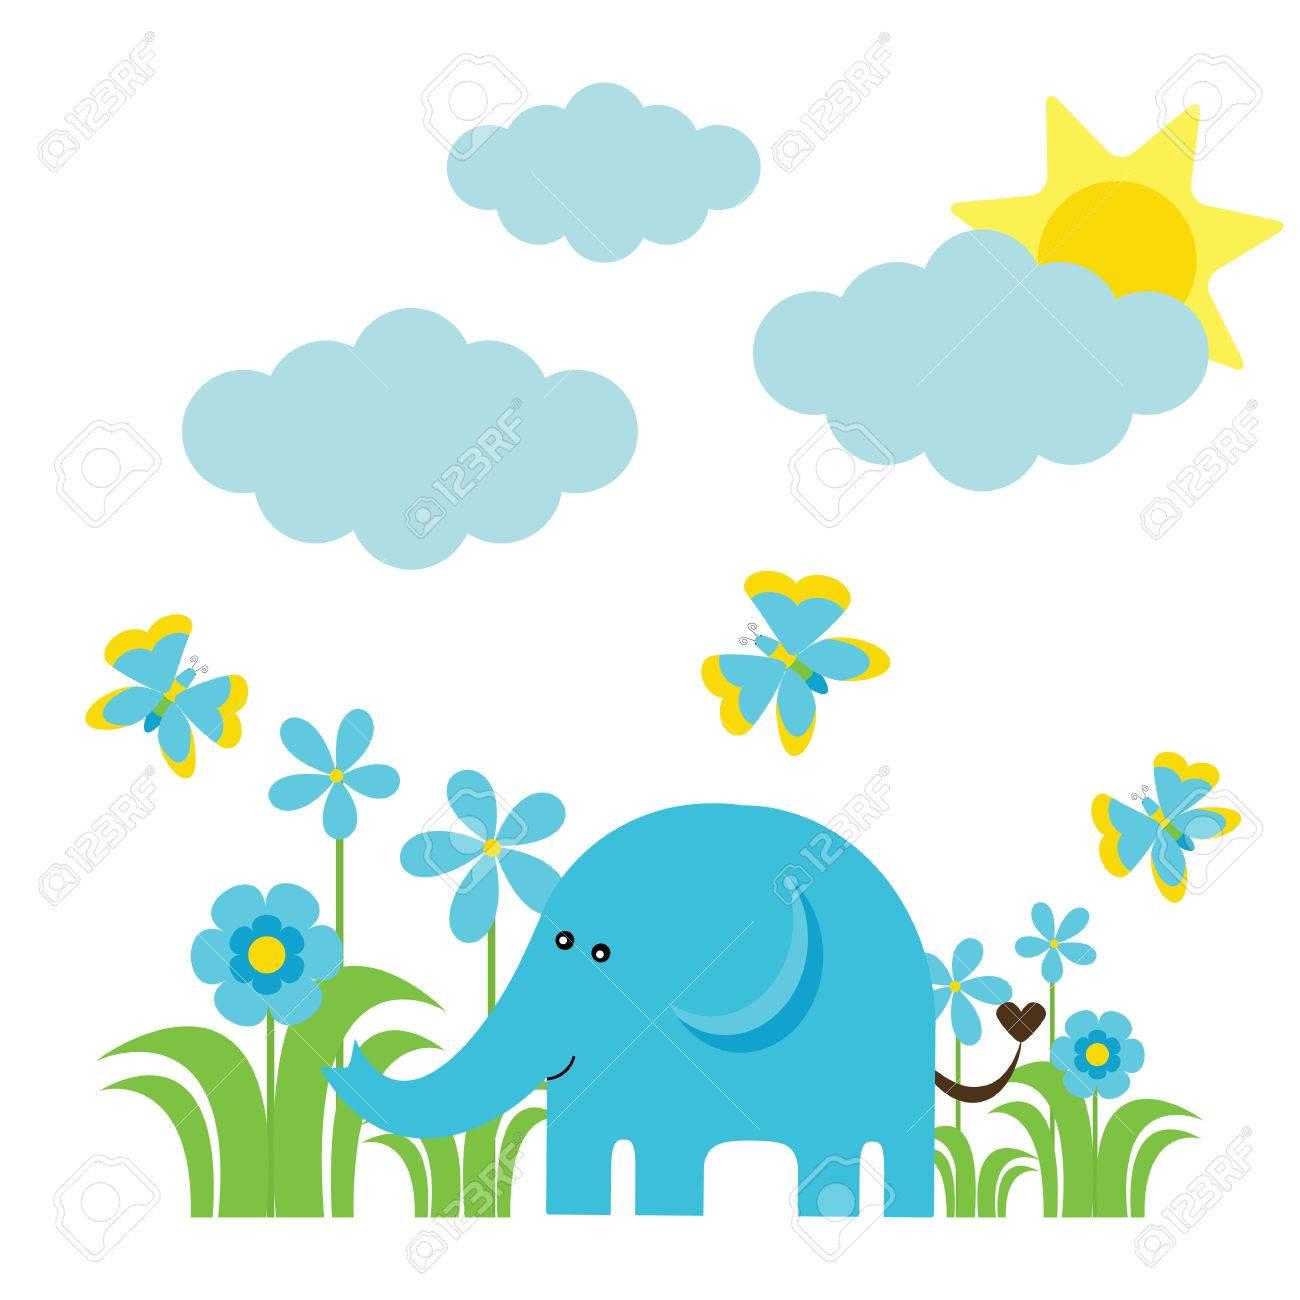 Good Wallpaper Cartoon Elephant - 74565636-cartoon-vector-of-cute-elephant-flowers-butterfly-and-sun-suitable-for-baby-nursery-wall-wallpaper-a  Gallery_801392  .jpg